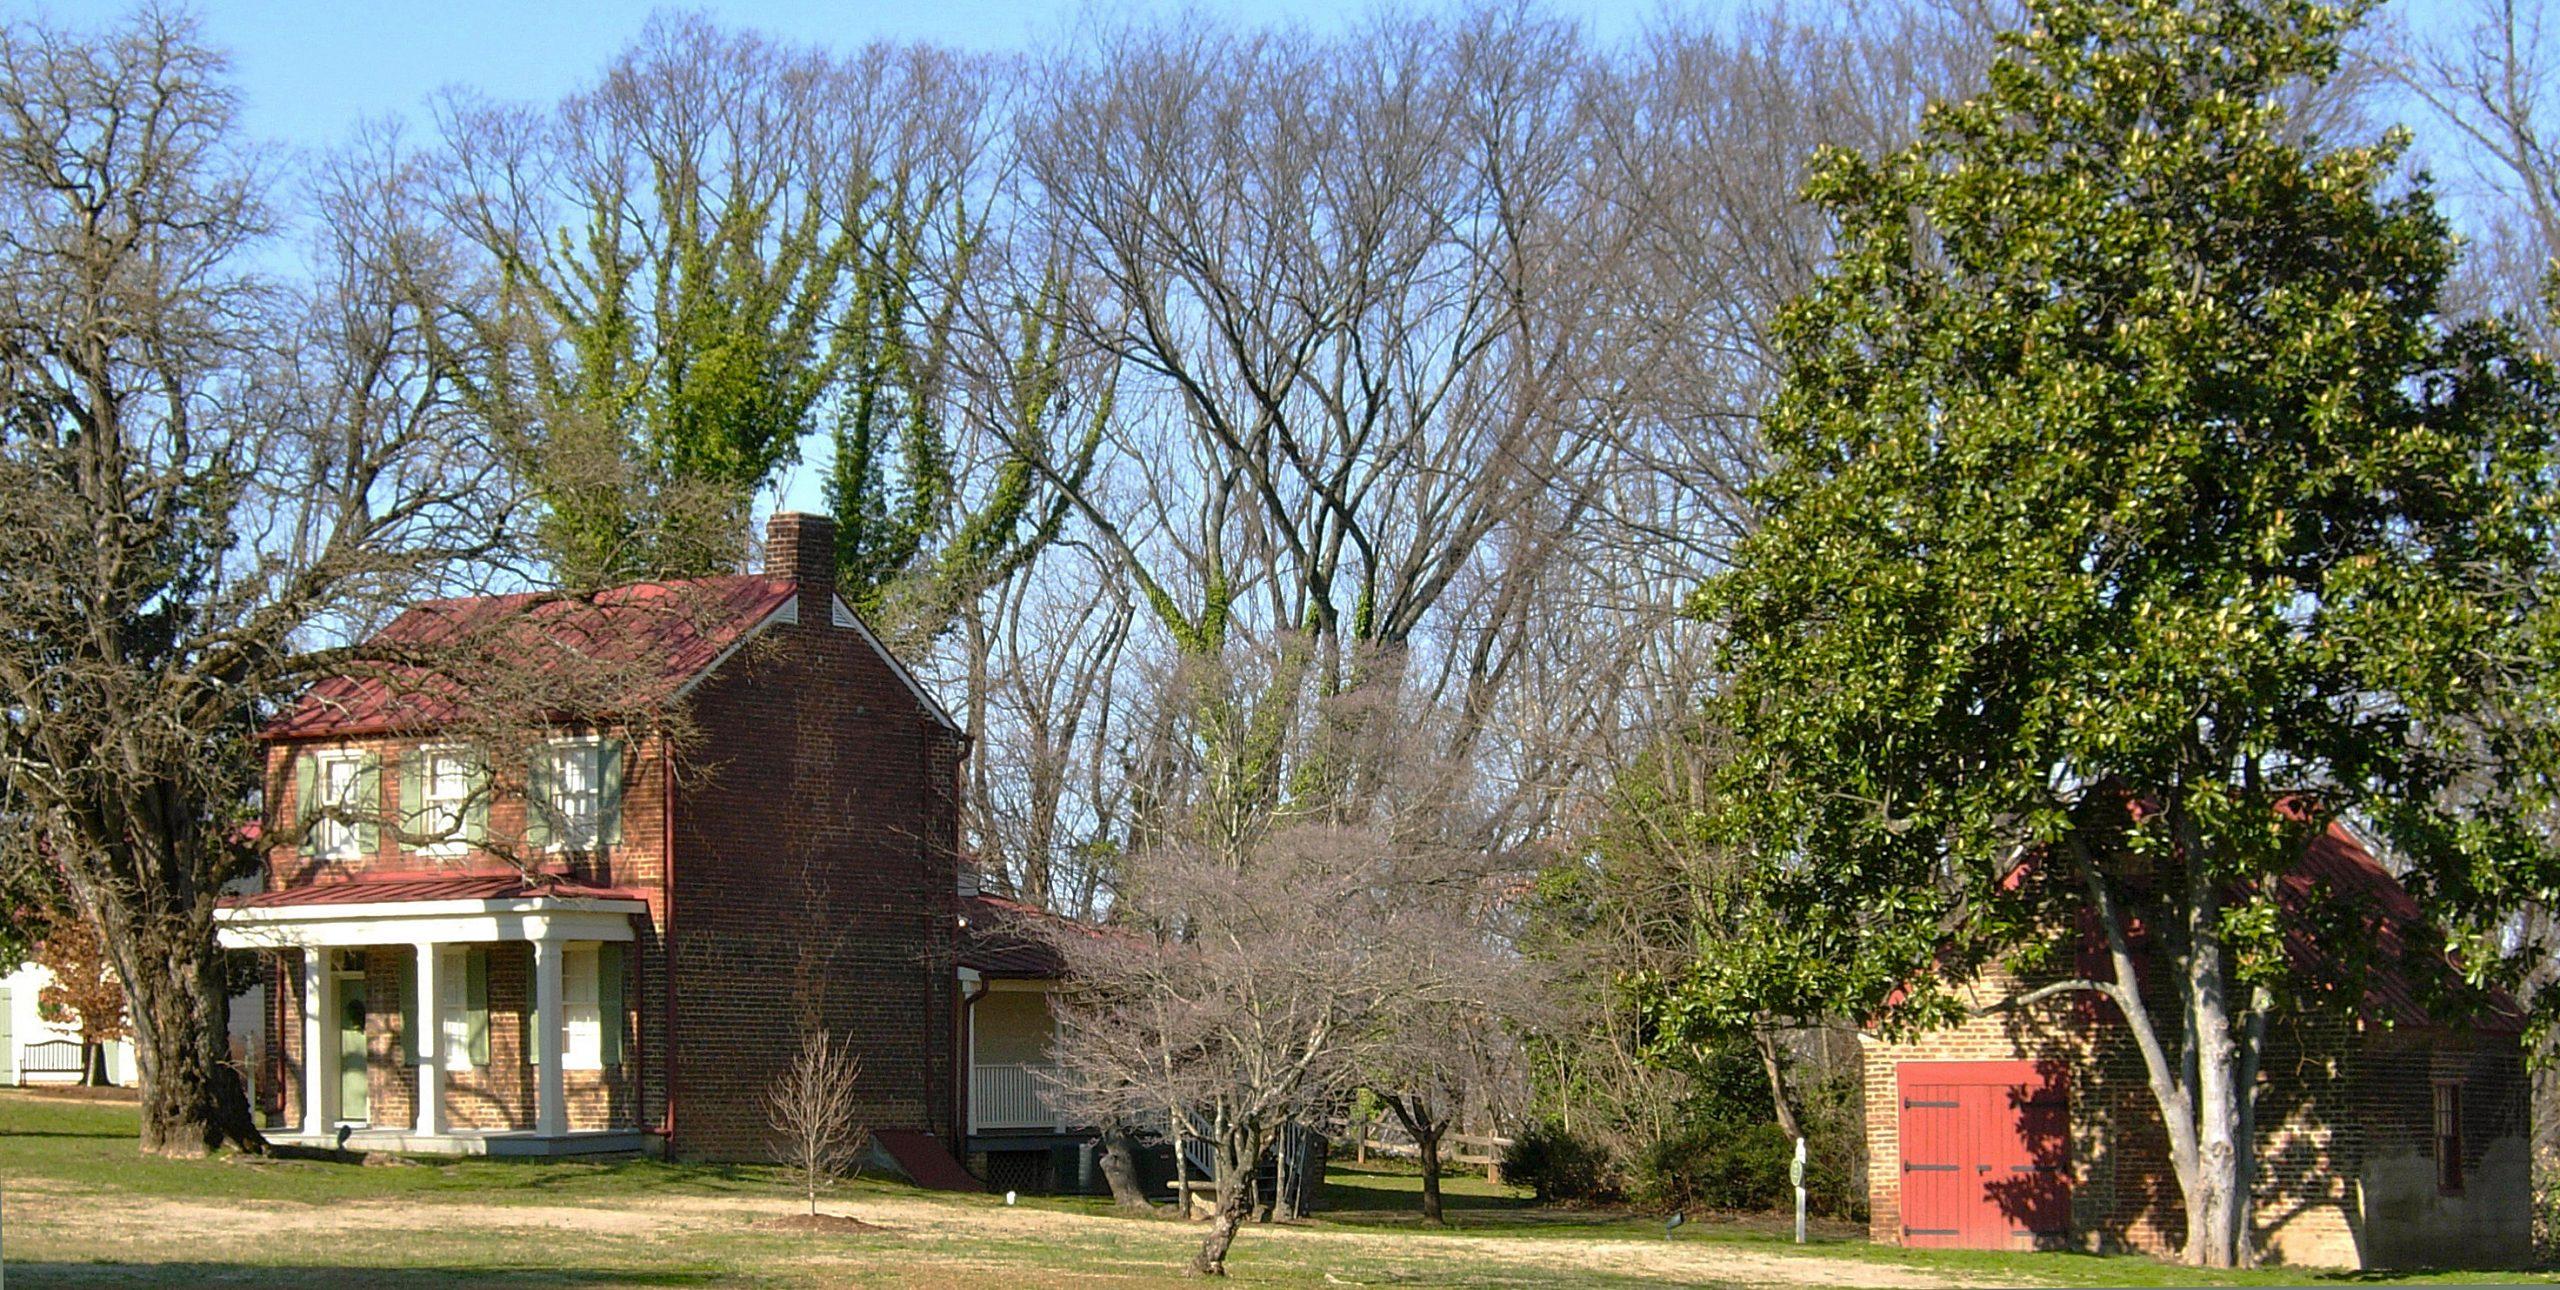 Clarke-Palmore House